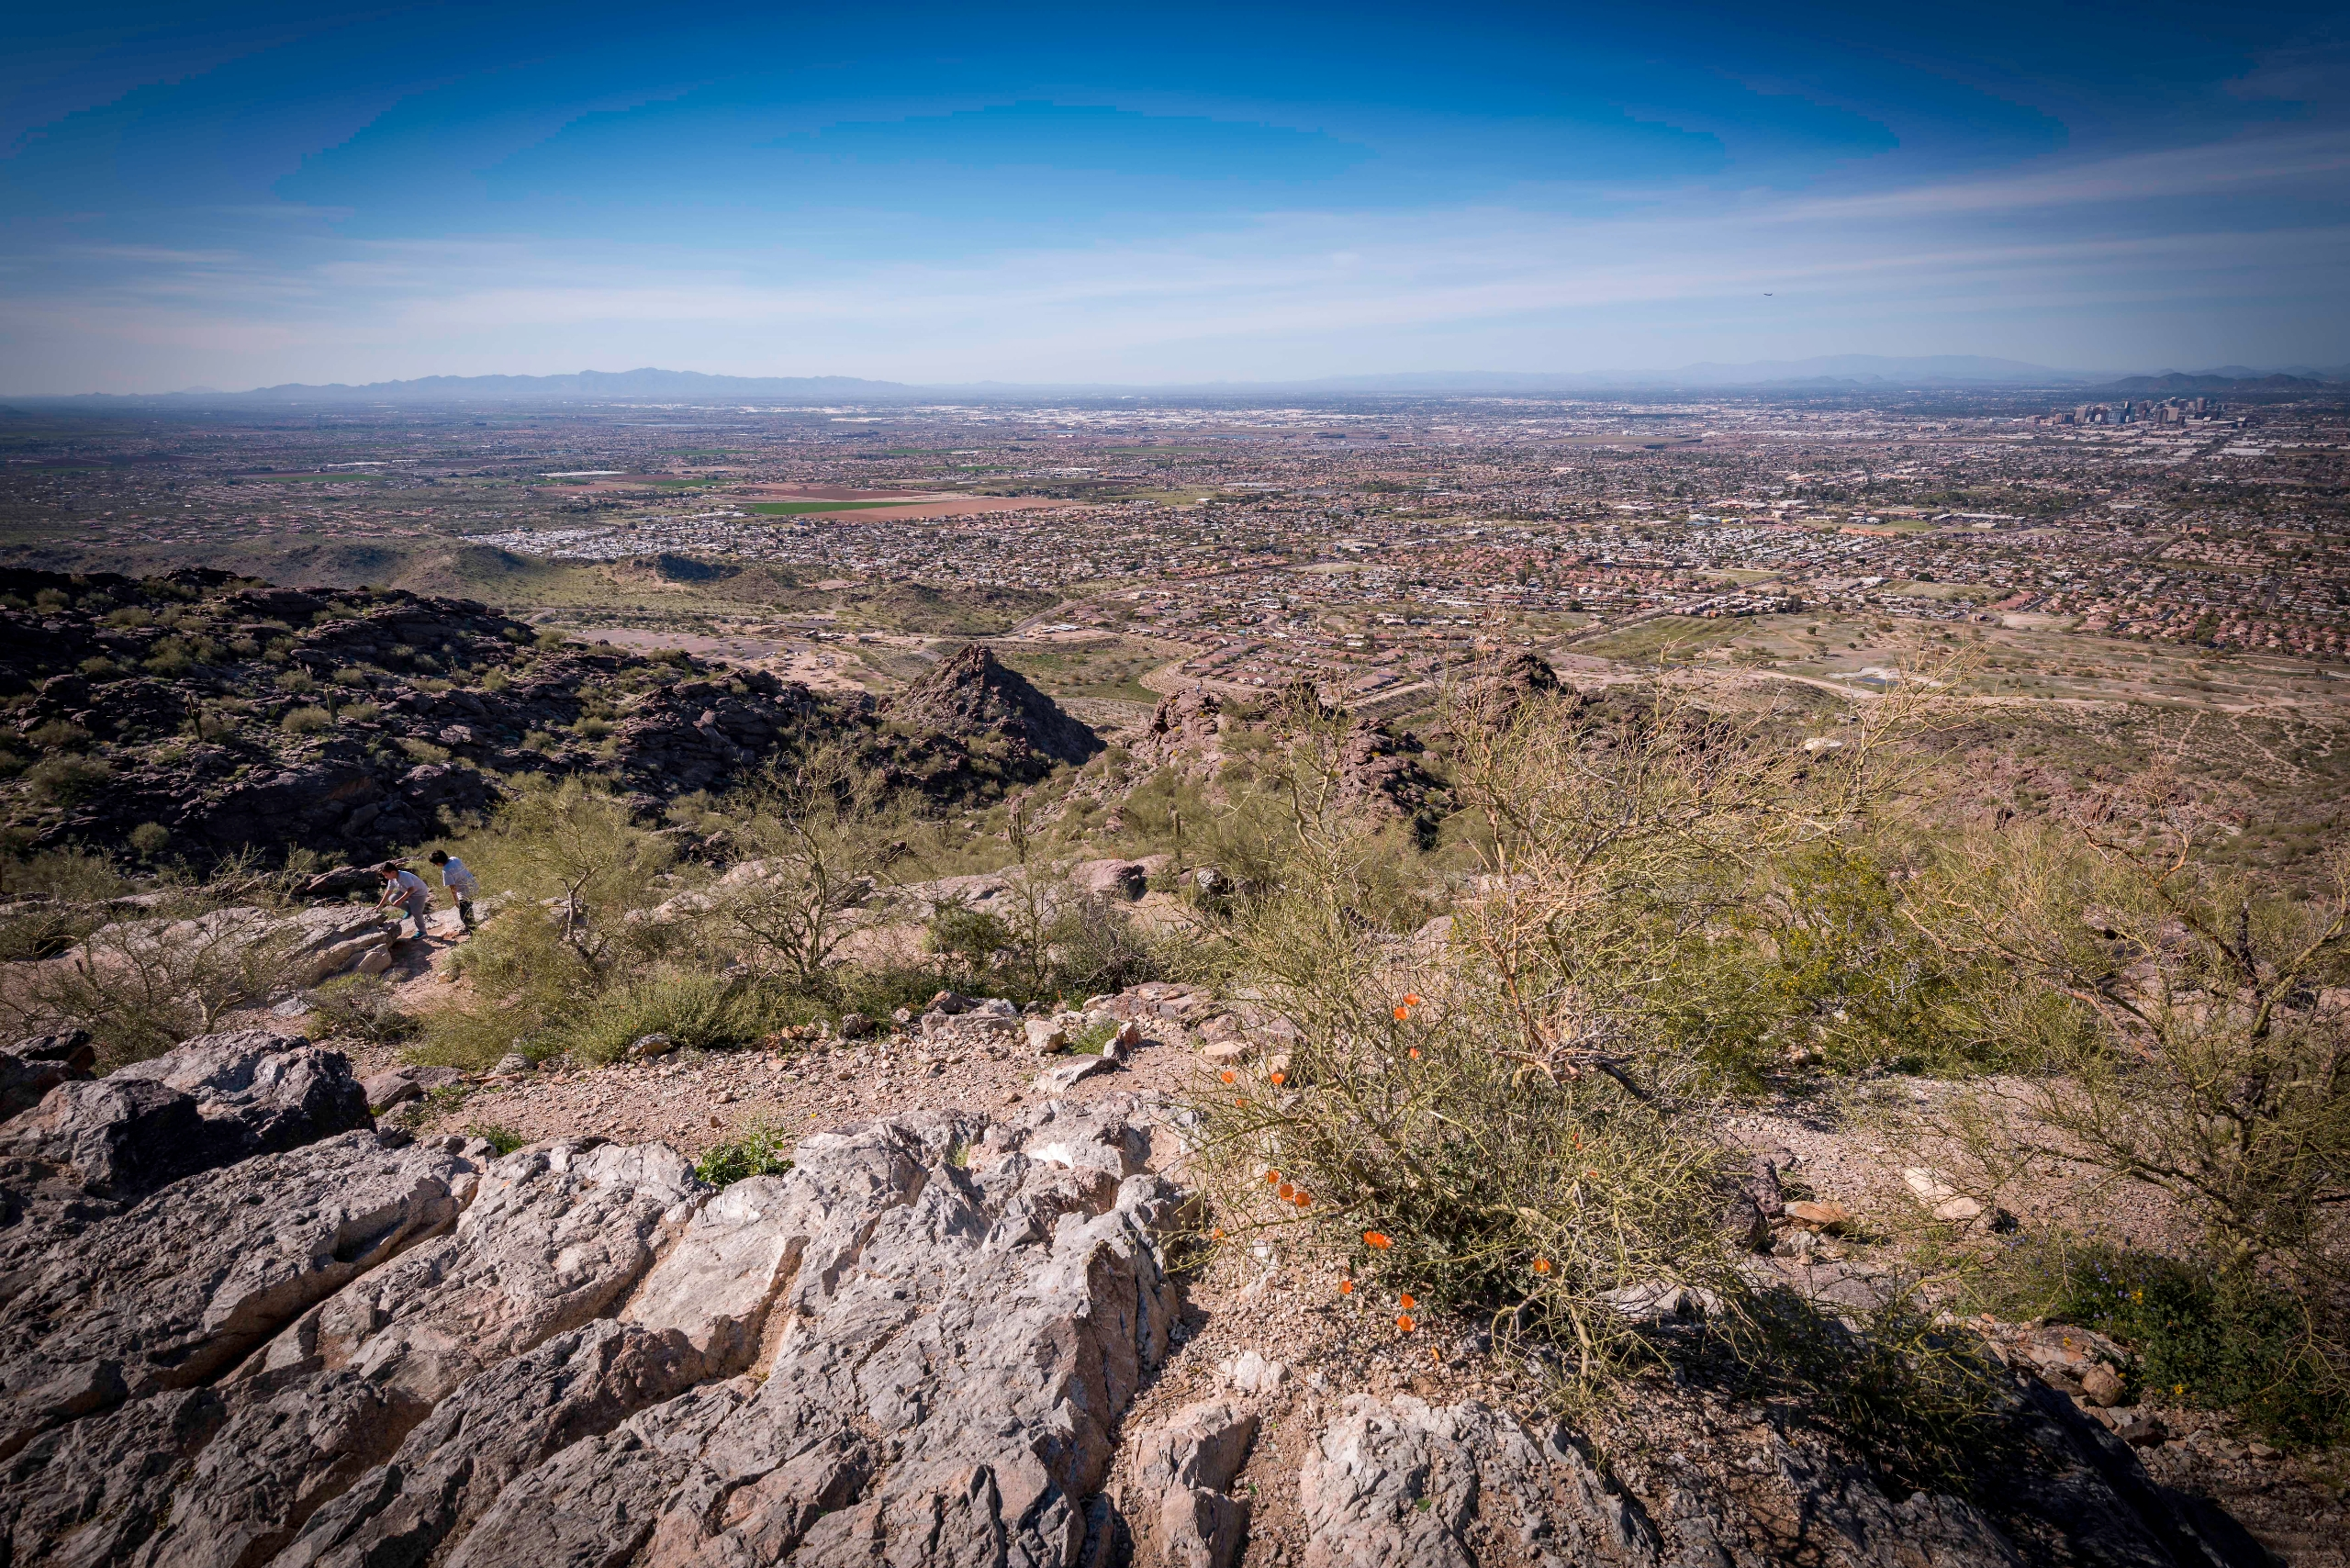 West Phoenix, 2017 photo South  - azdrk | ello